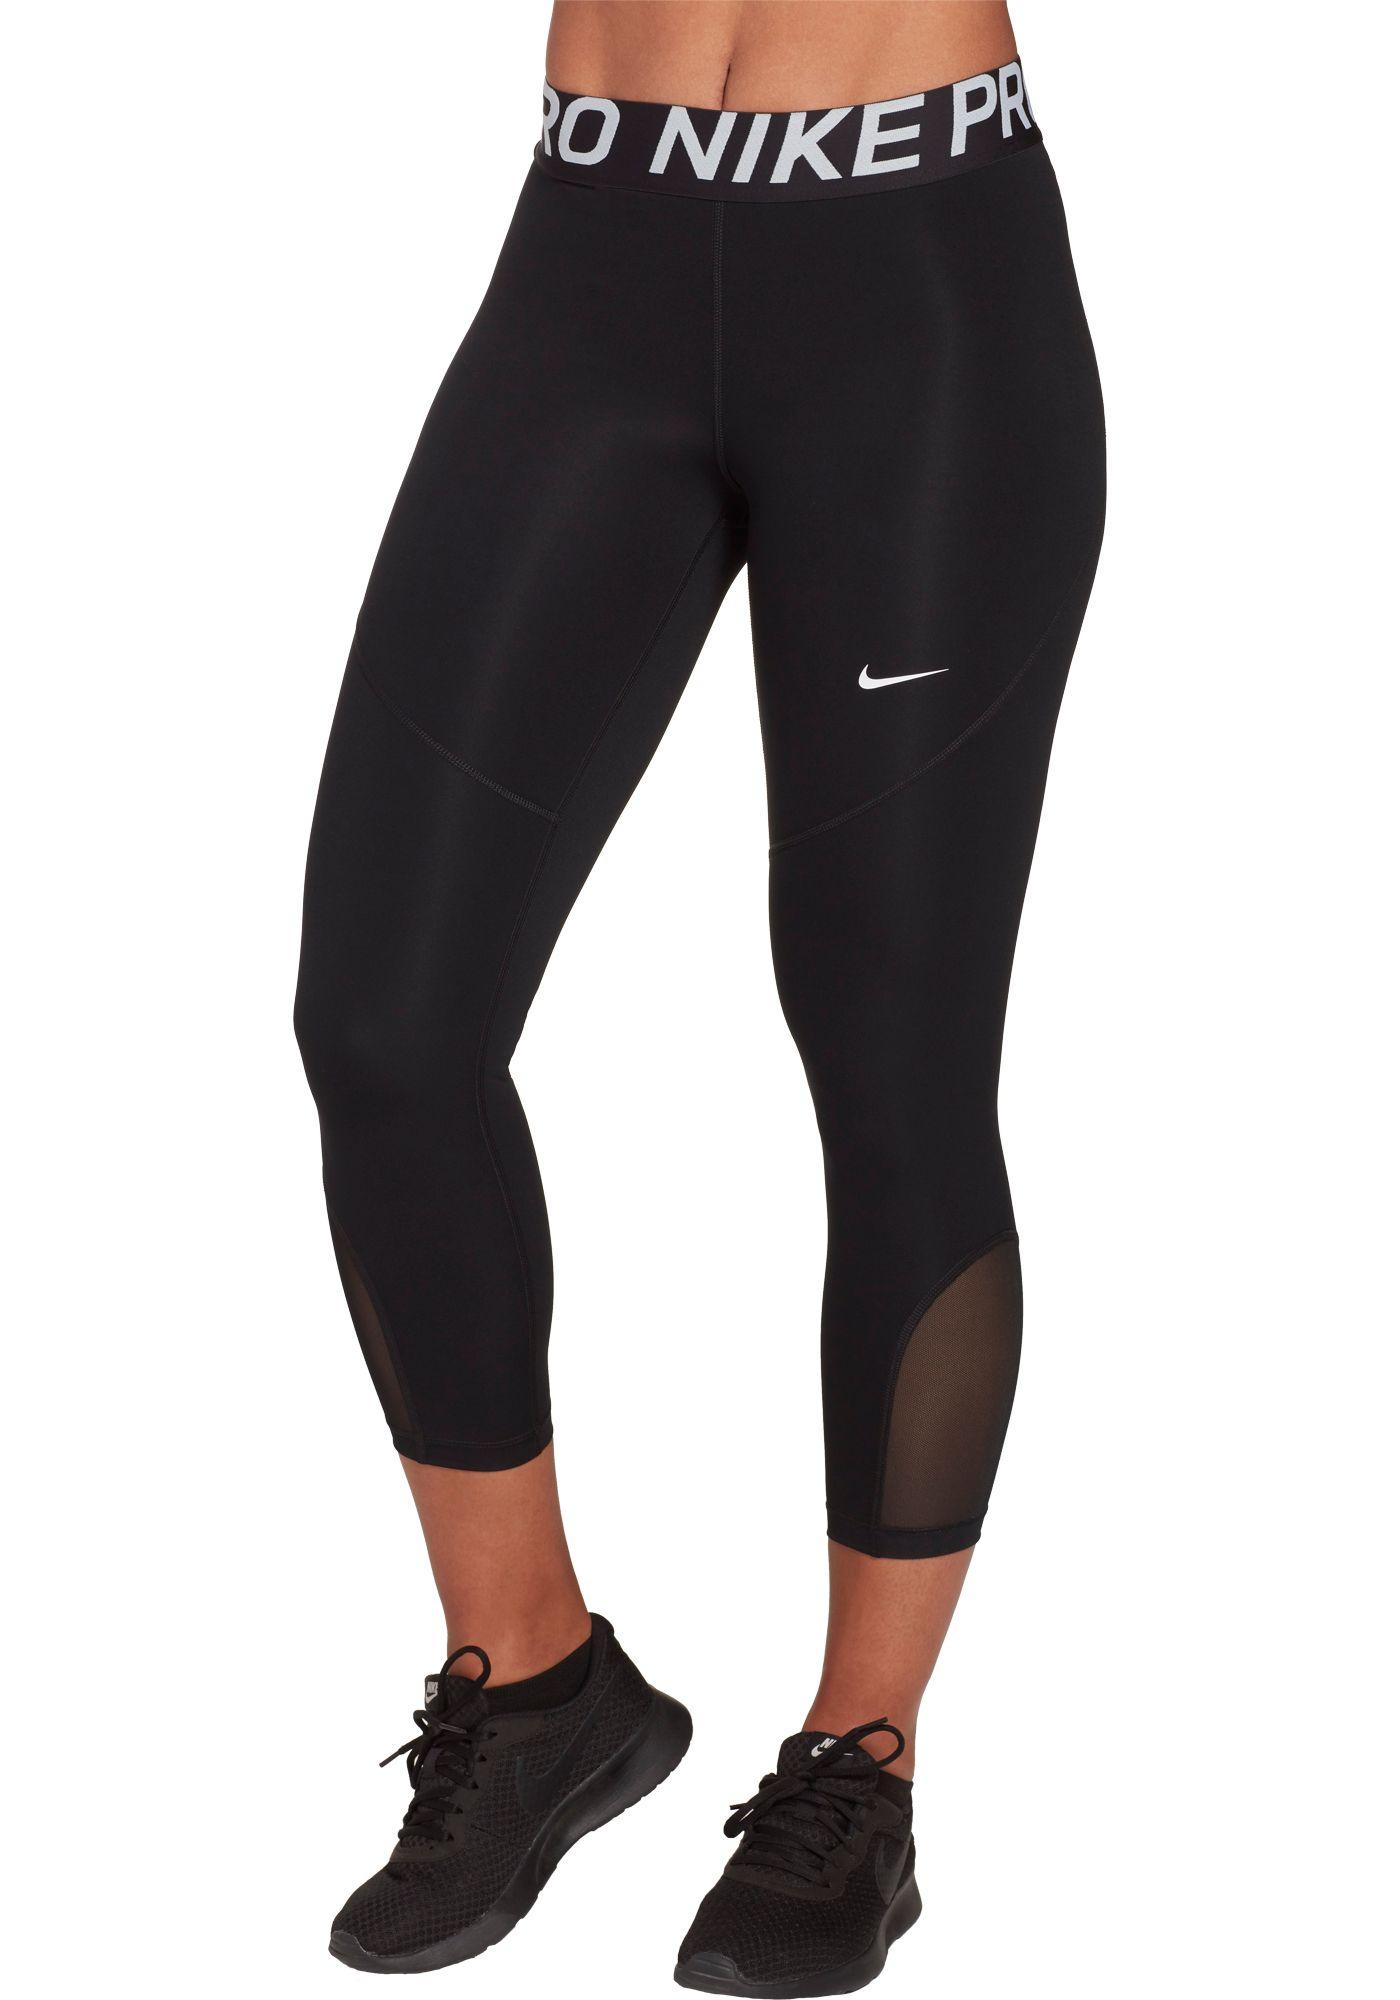 Nike Women's Pro Crop Tights